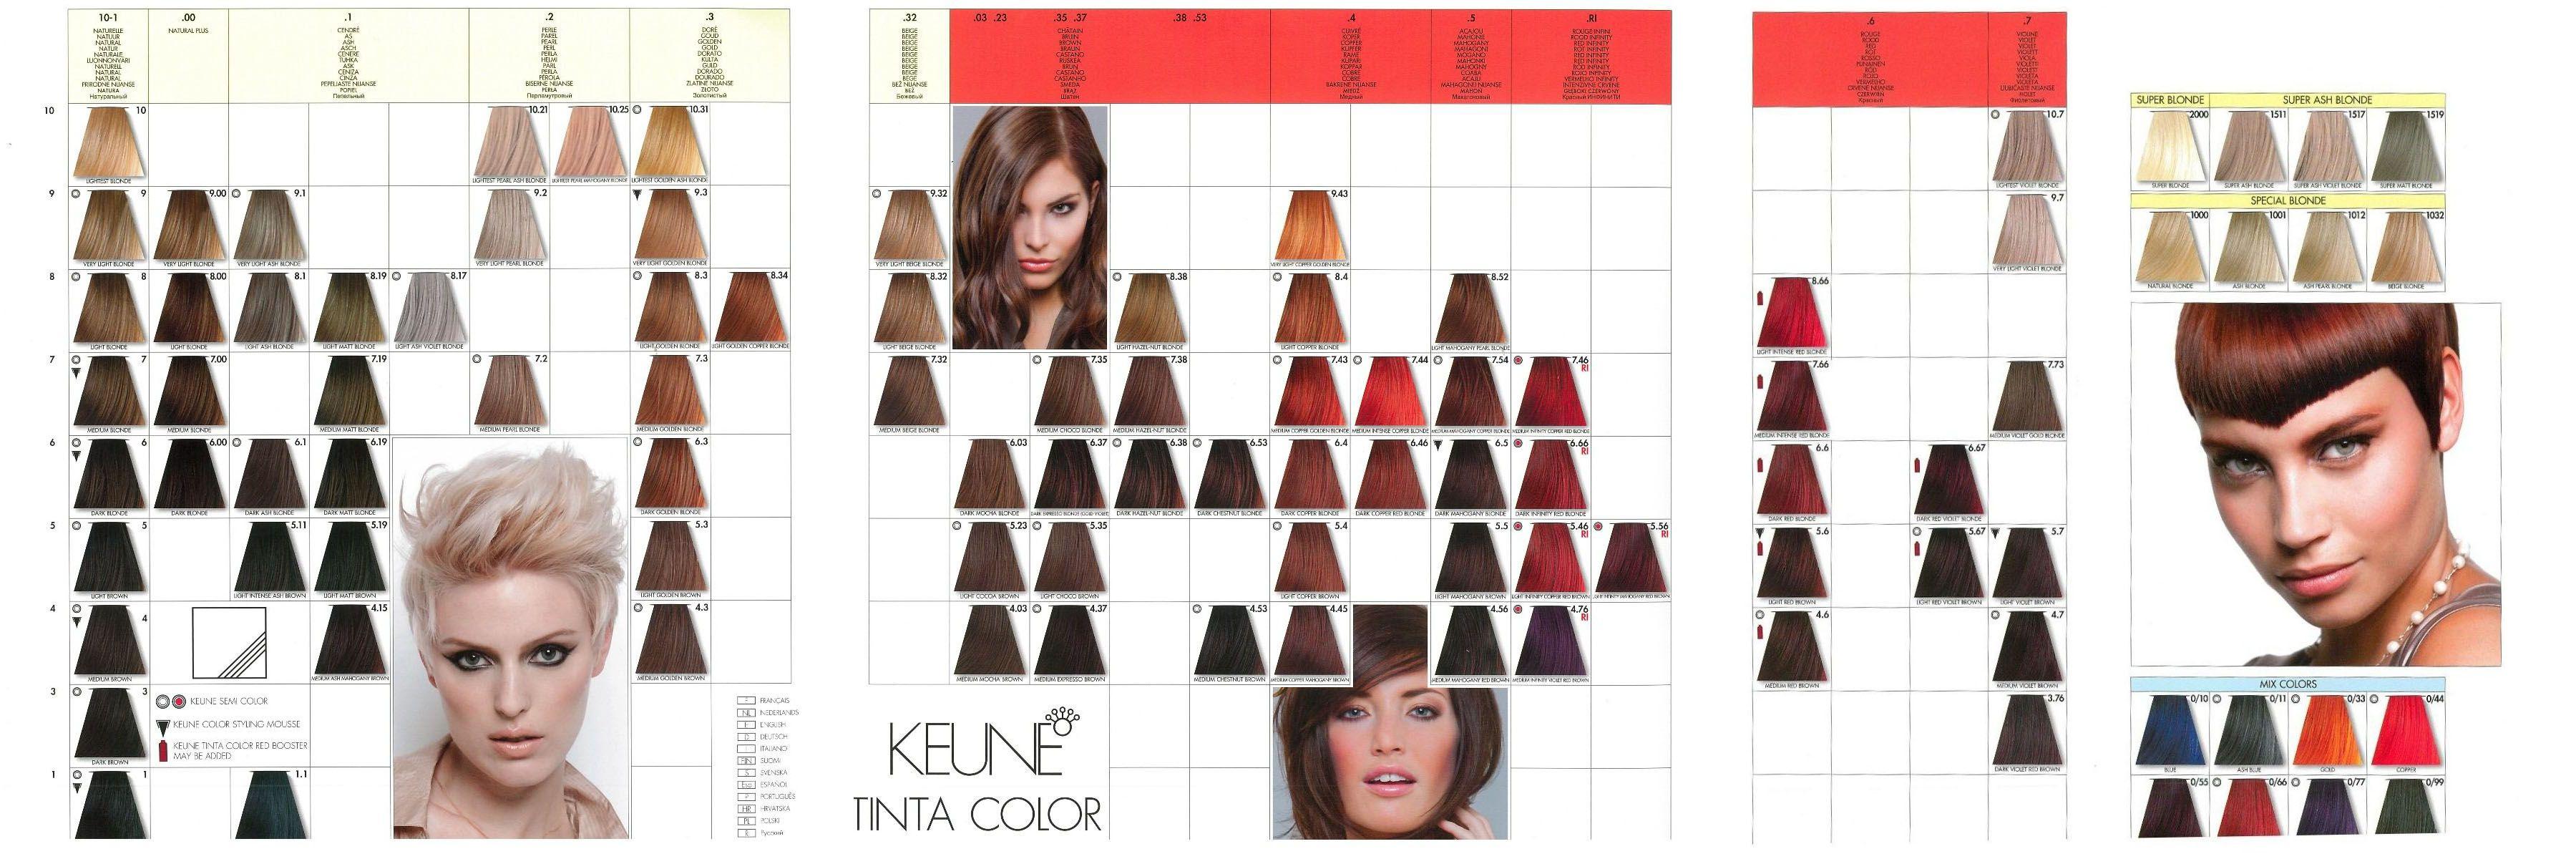 Keune Tinta Color Shades Chart Hair Color Chart Hair Color Shades Hair Color